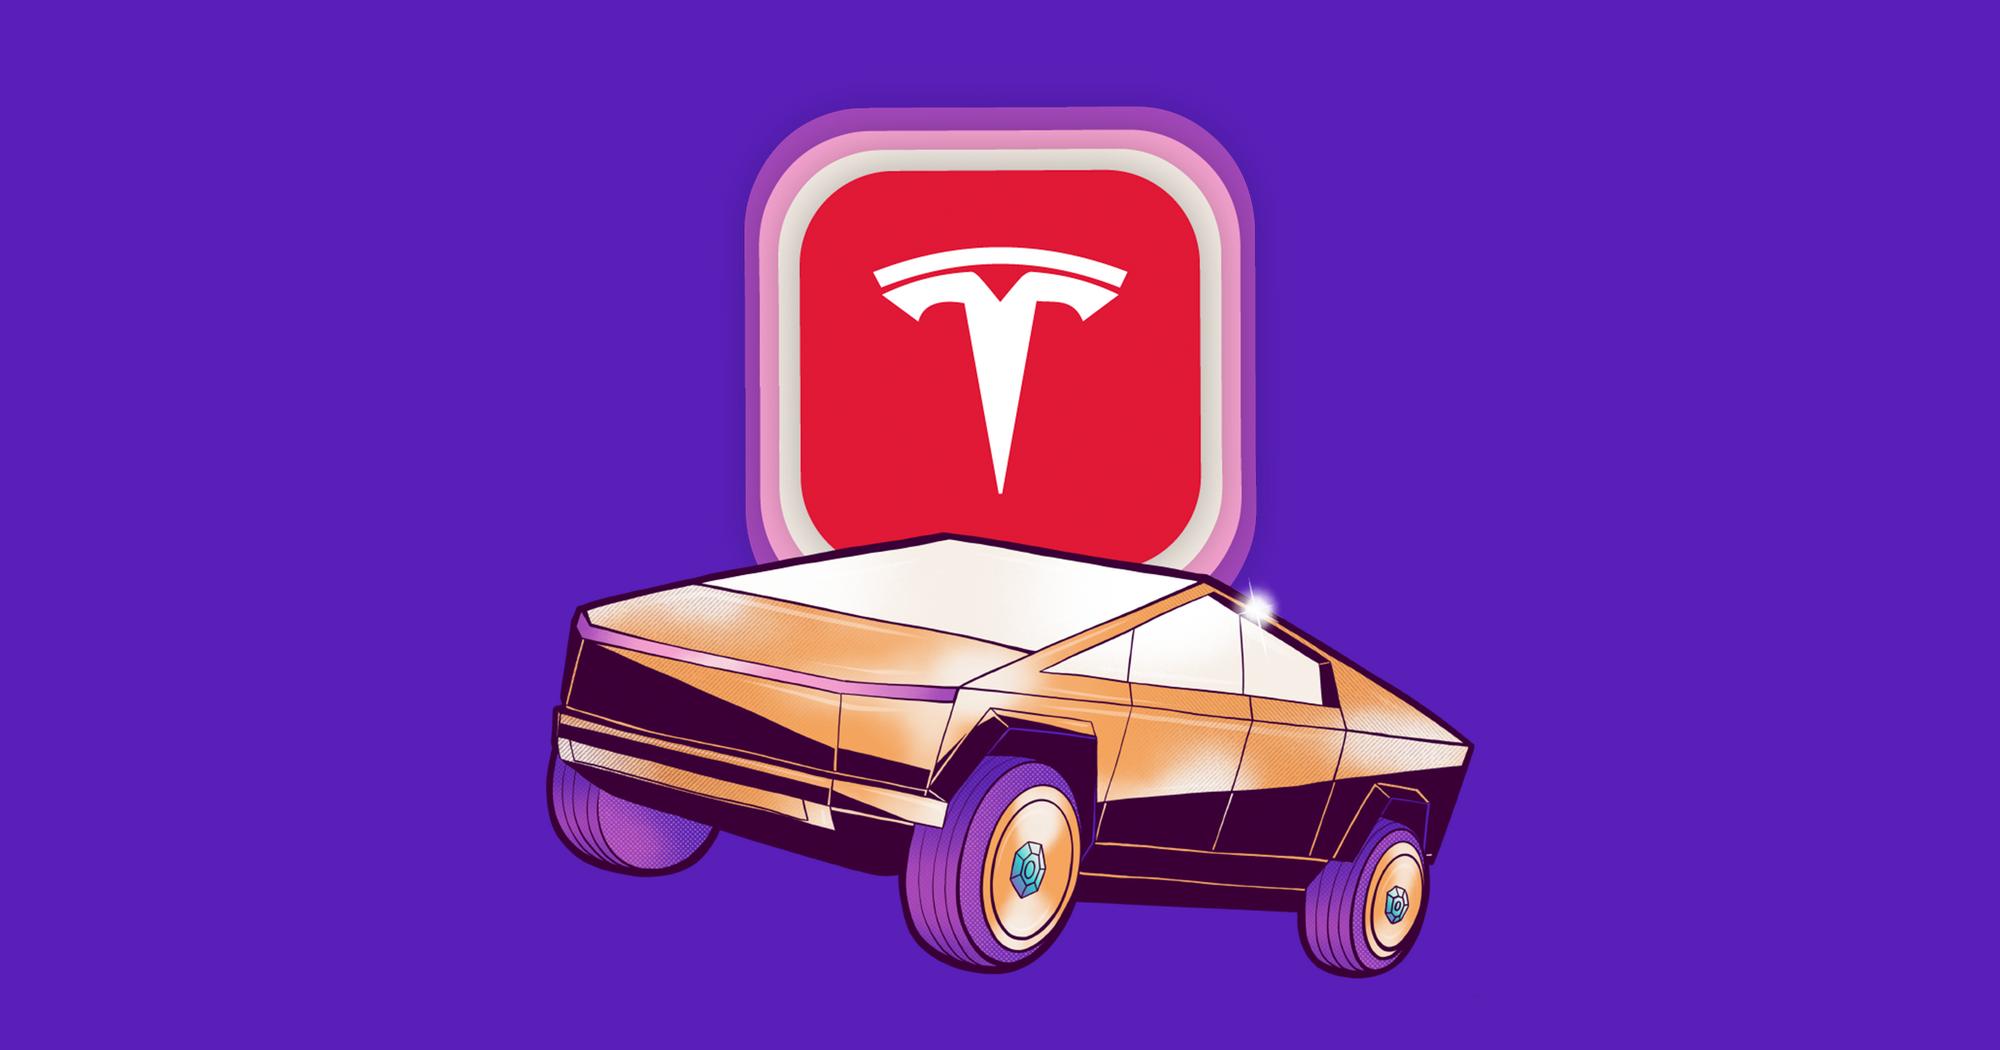 Buy Tesla shares